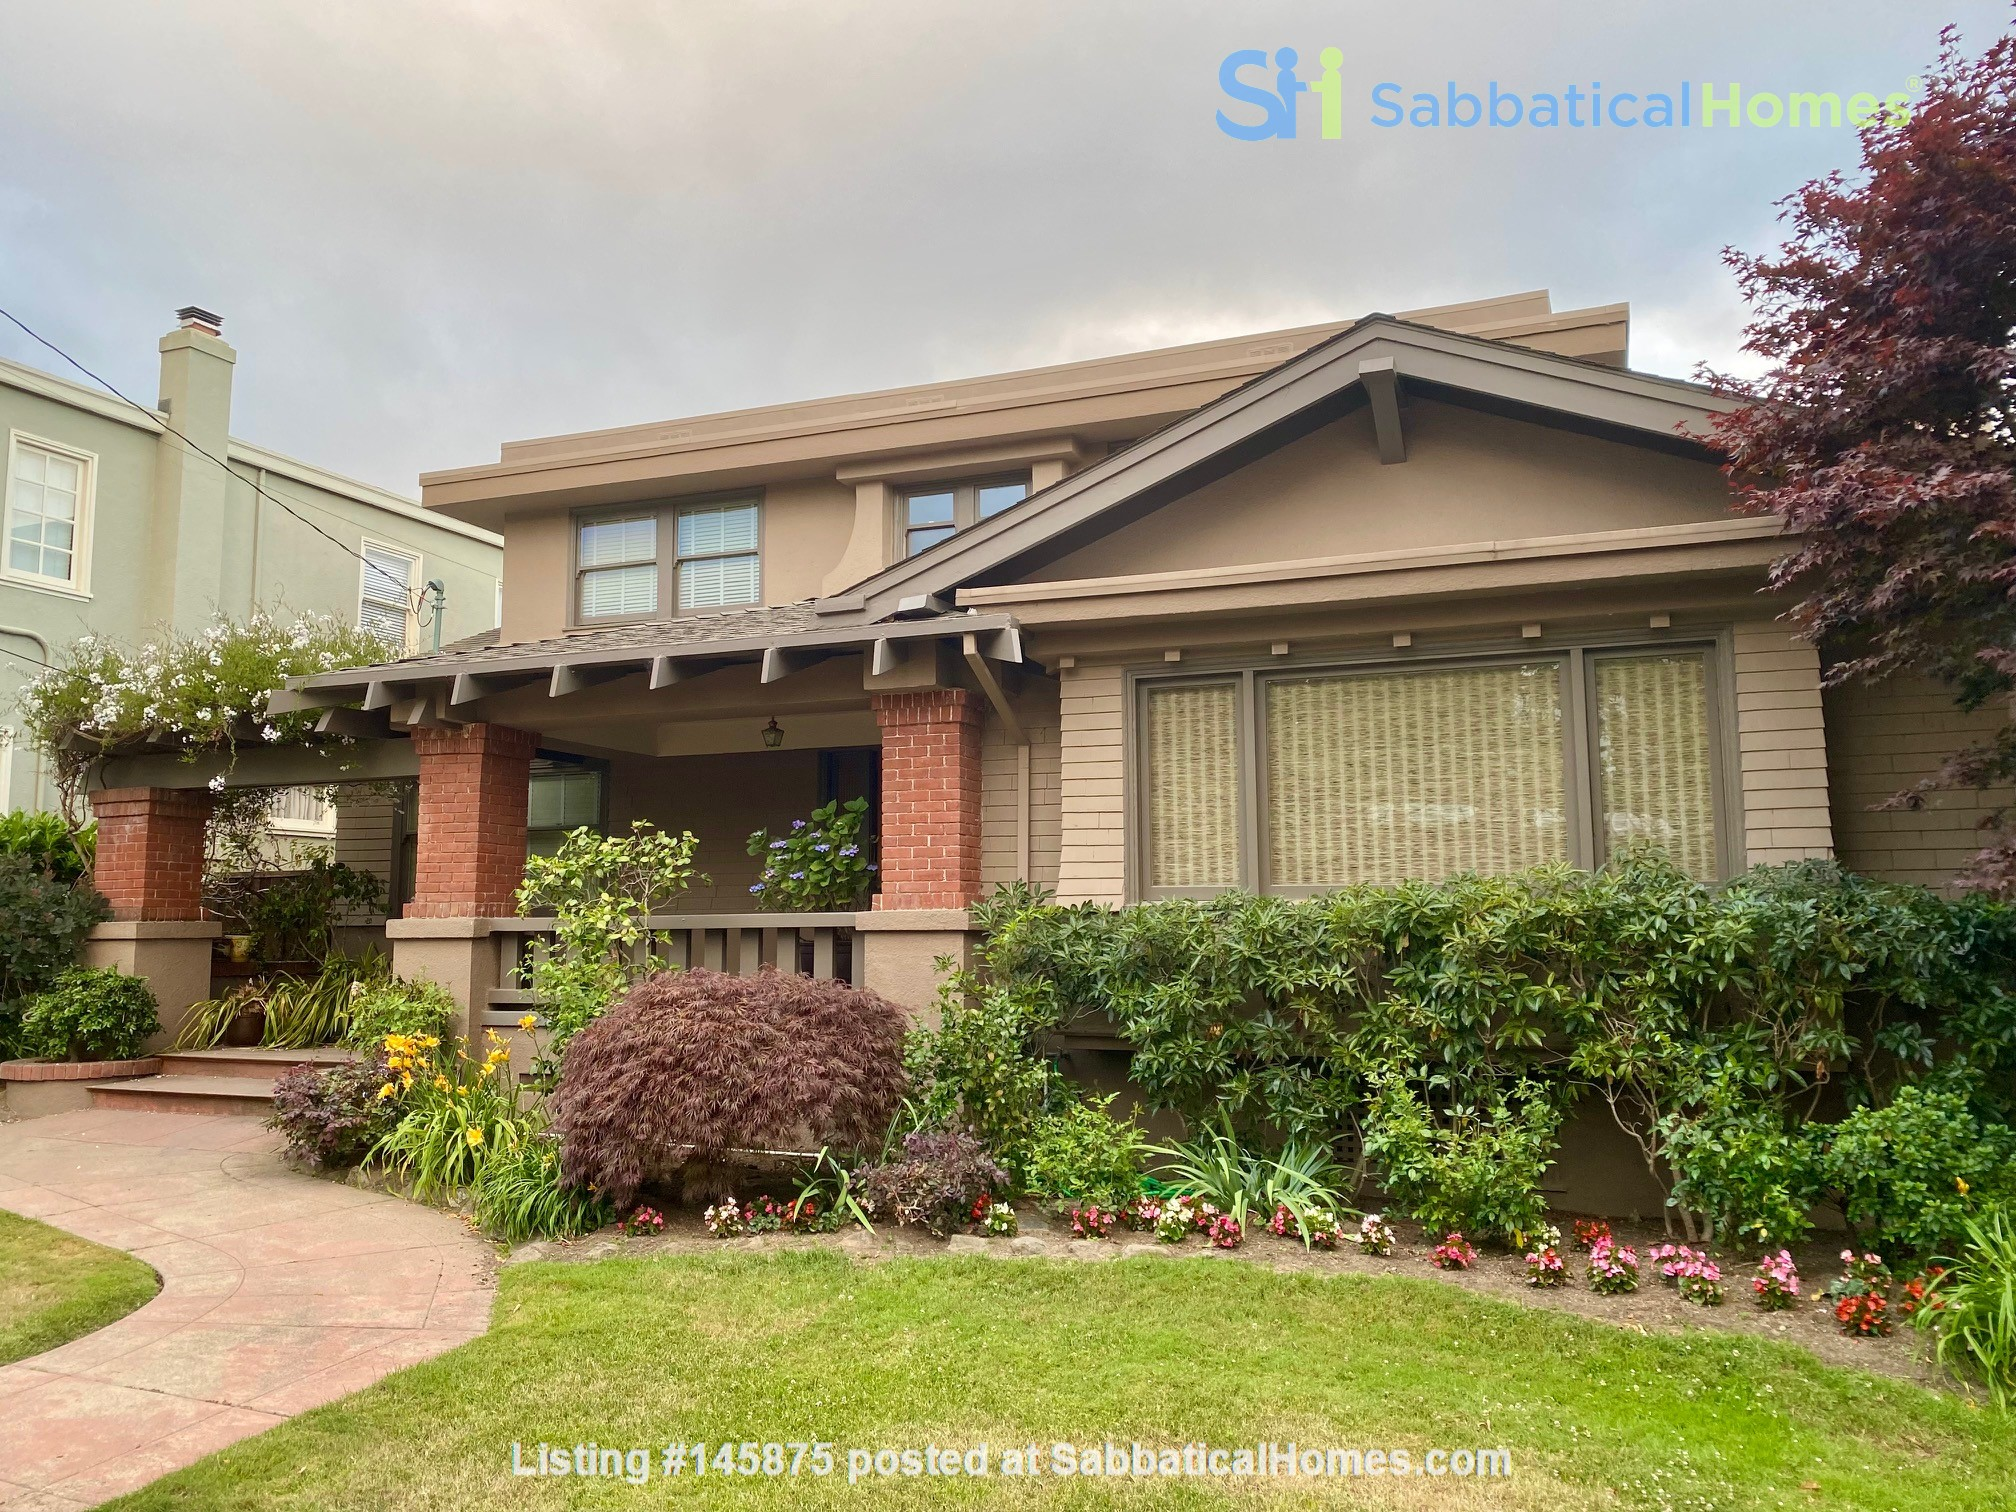 Beautiful 4 Bedroom Craftsman Home in Highly Rated Piedmont School District Home Rental in Piedmont 1